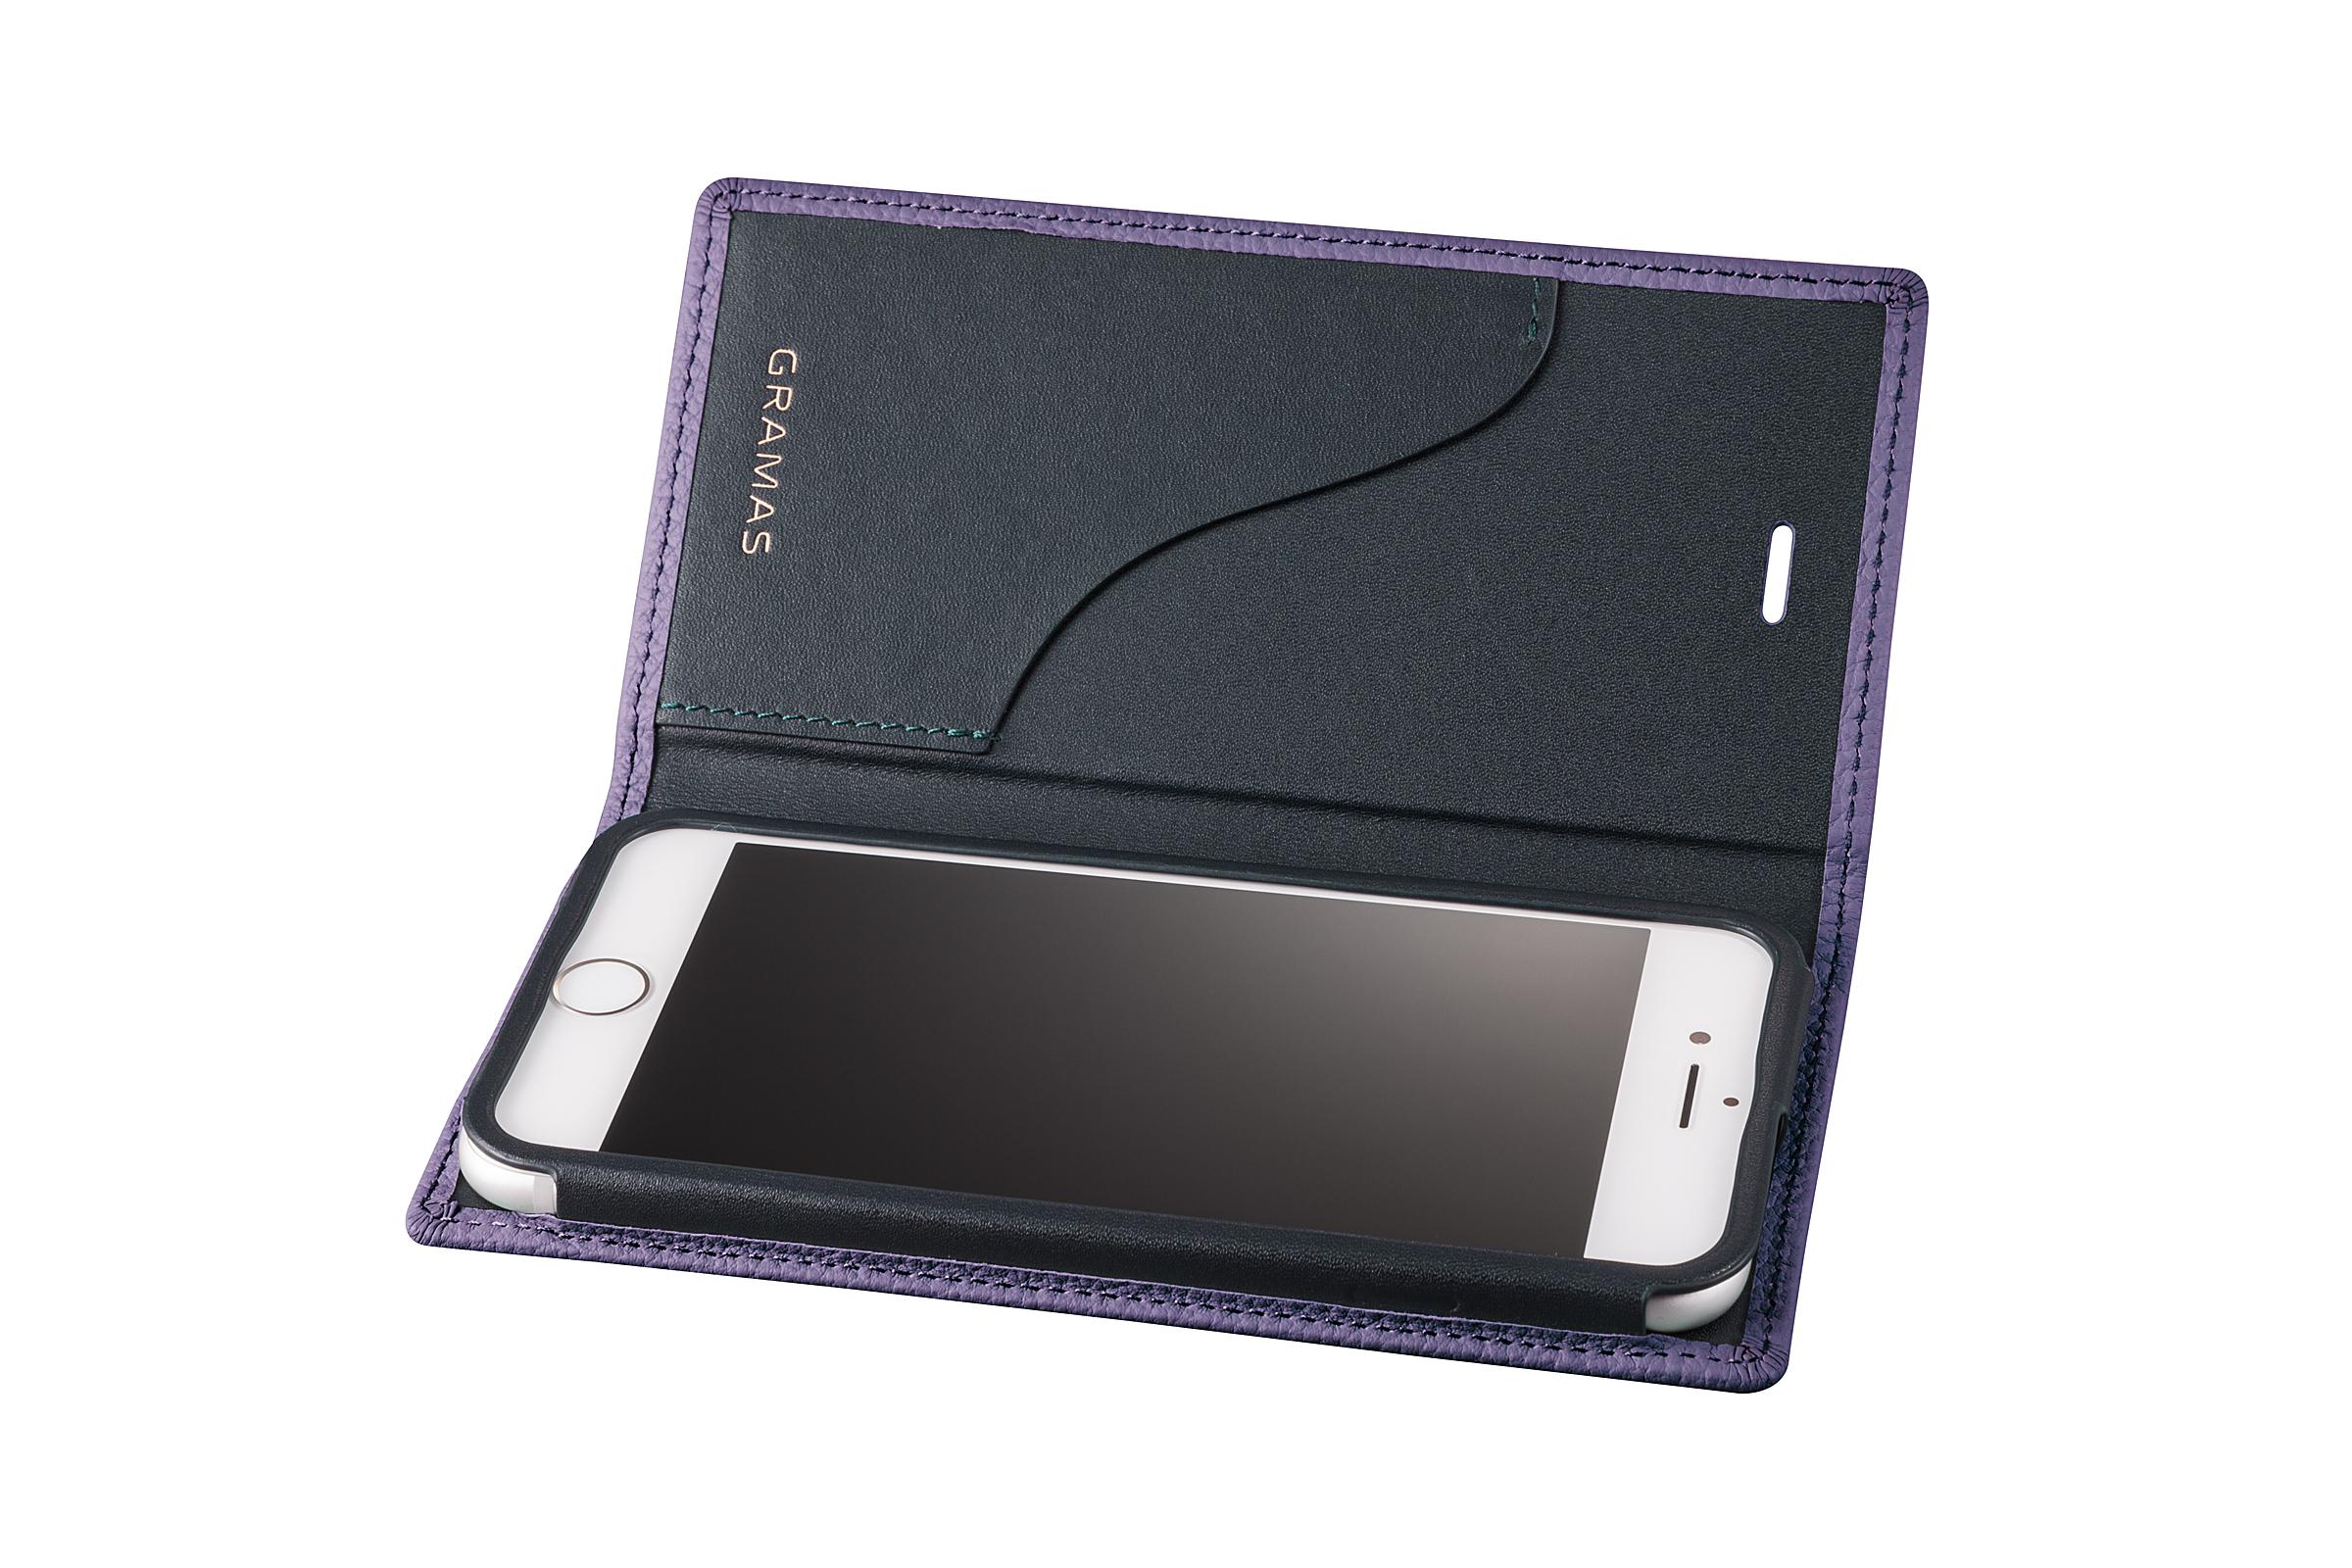 GRAMAS Shrunken-calf Full Leather Case for iPhone 7(Purple) シュランケンカーフ 手帳型フルレザーケース GLC646PR - 画像3